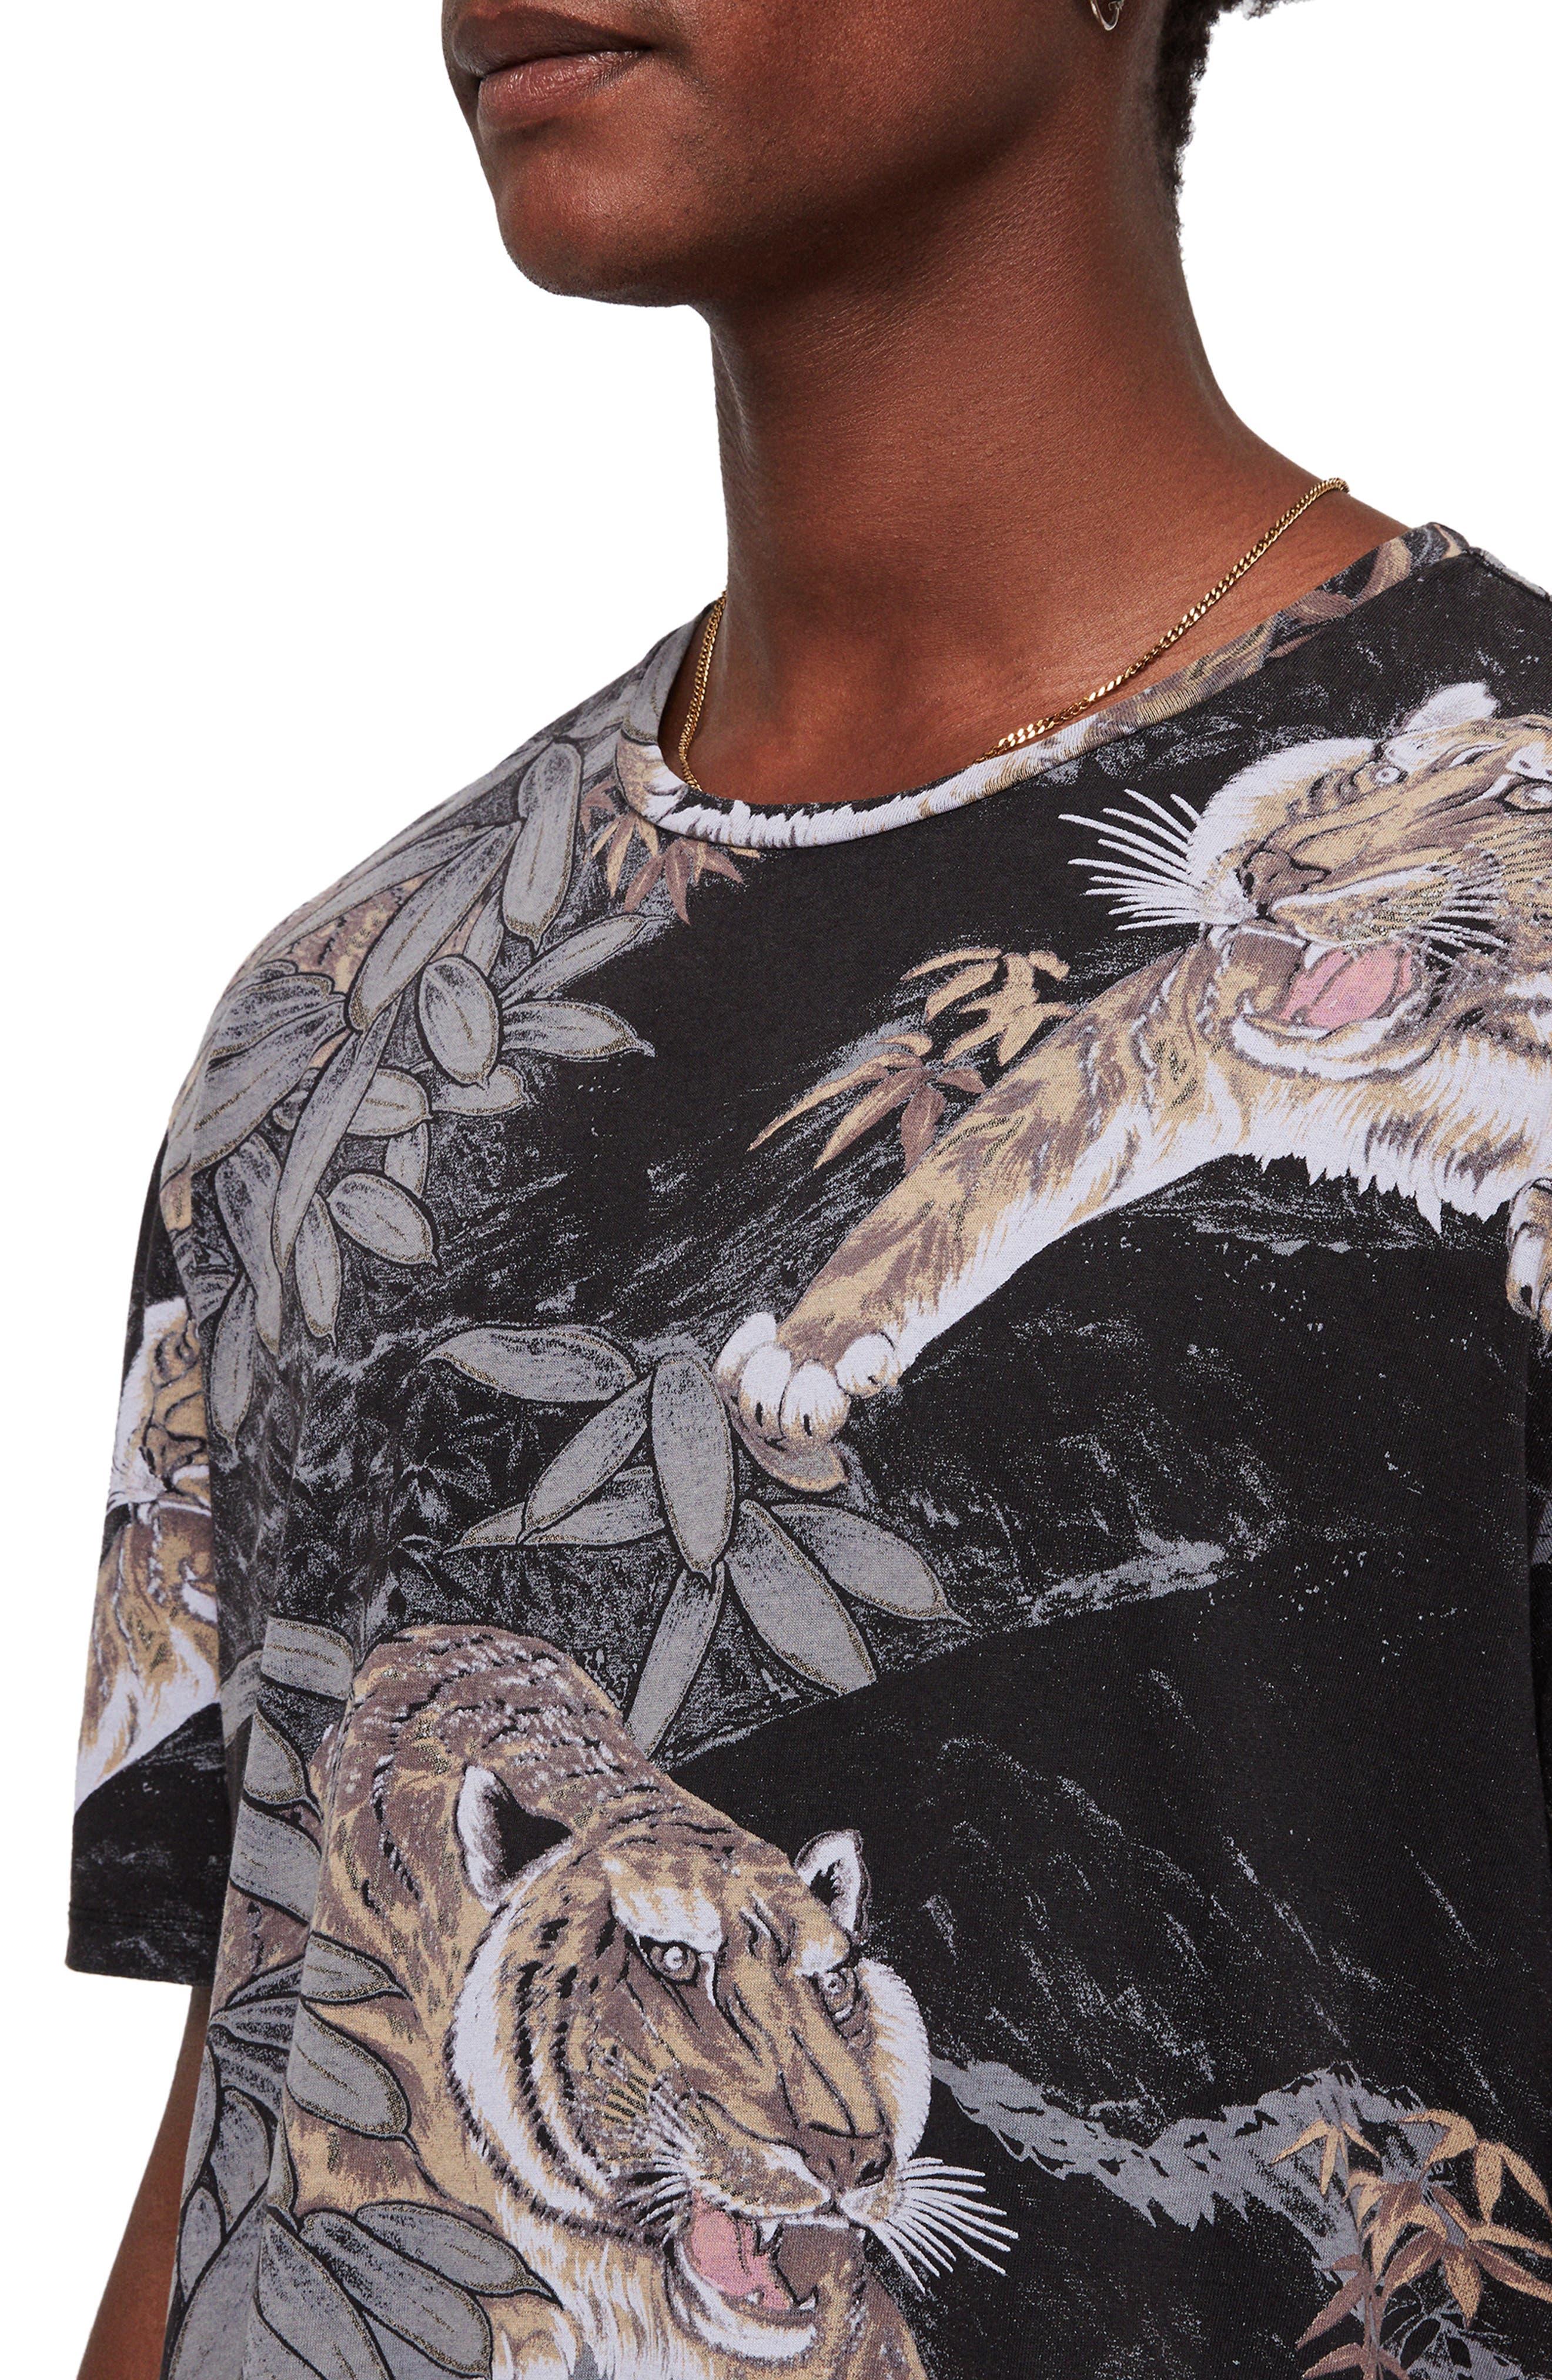 Chokai Slim Fit T-Shirt,                             Alternate thumbnail 4, color,                             004